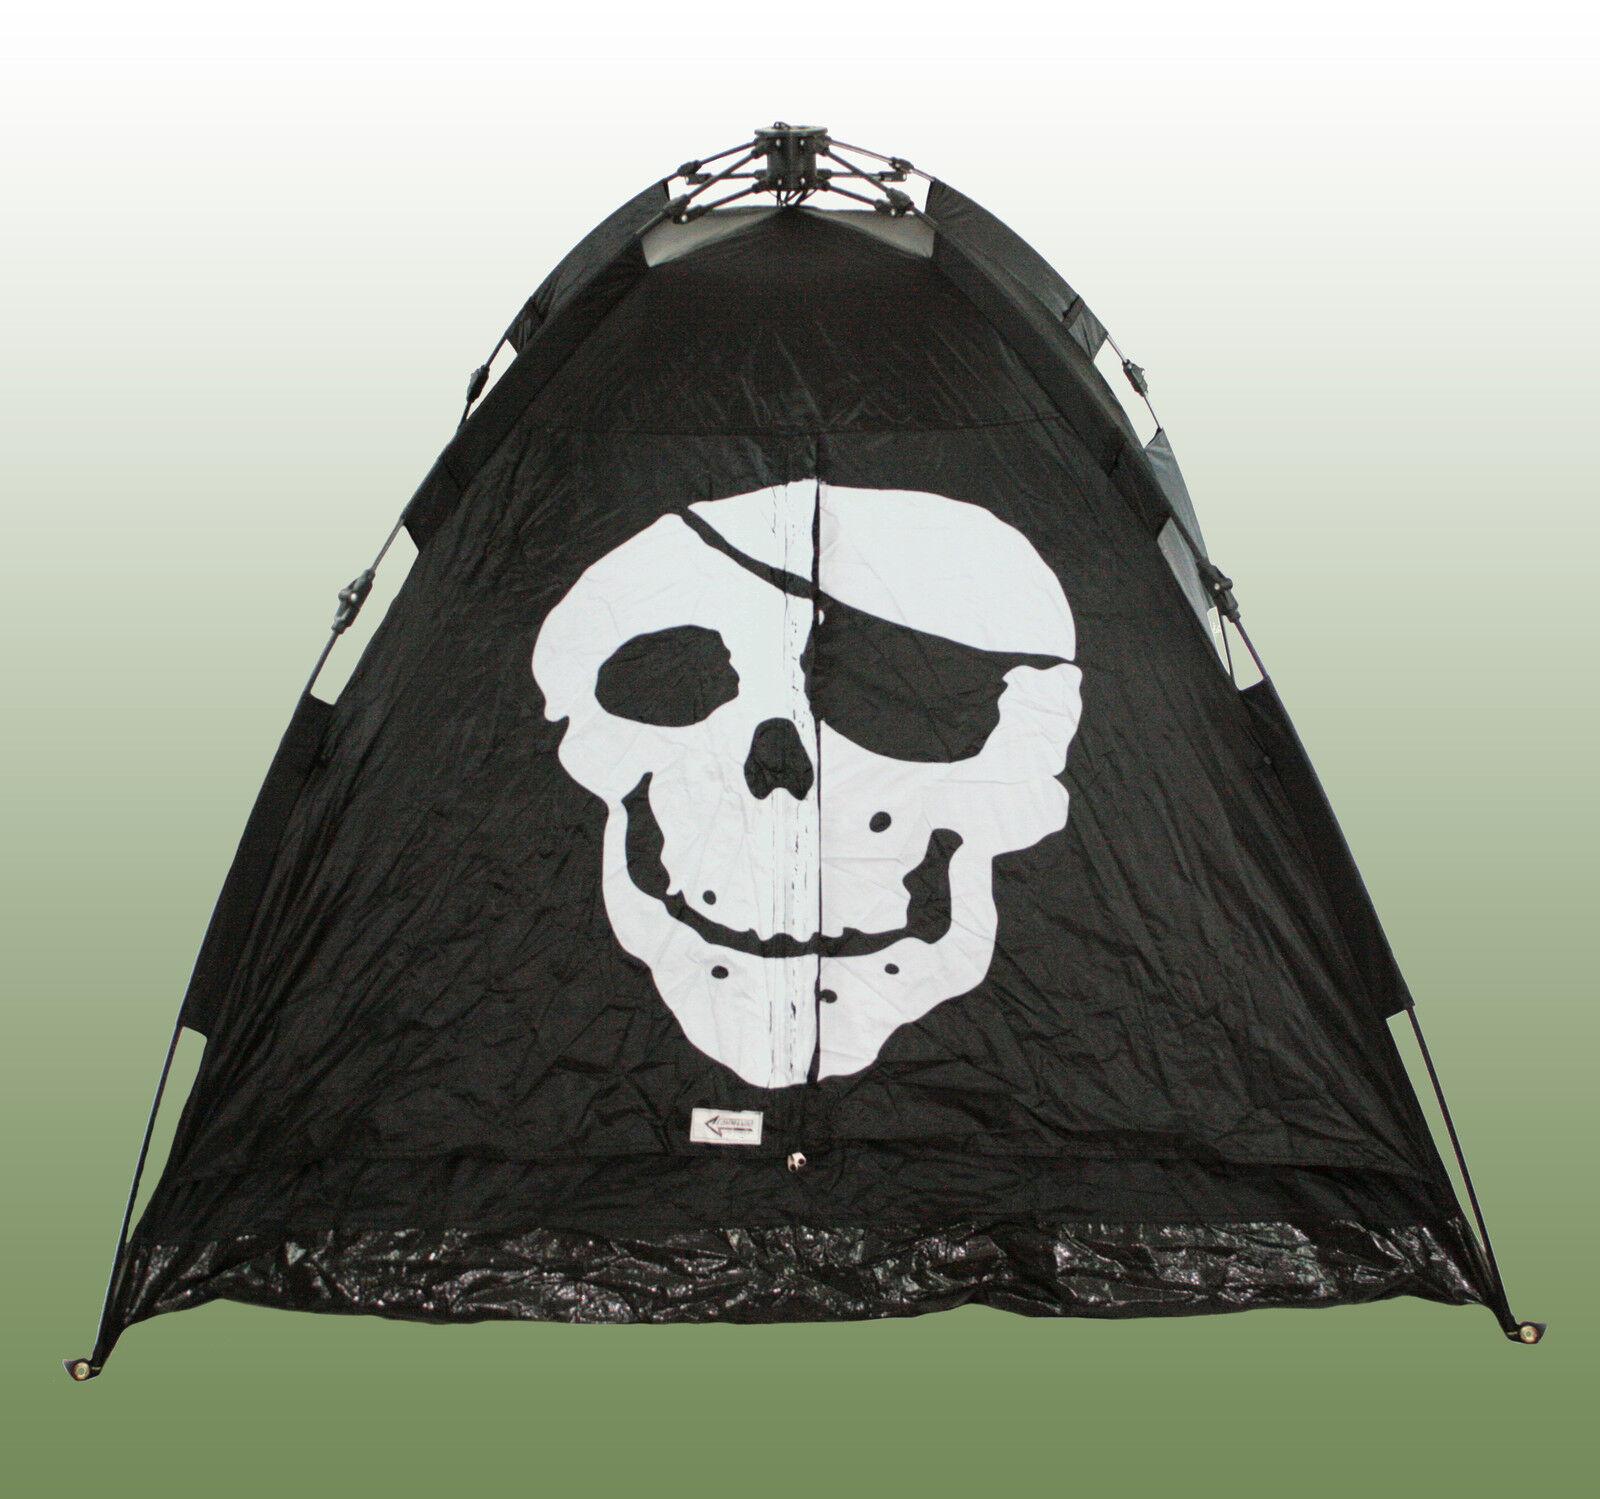 Schnellaufbauzelt Jolly Roger Zelt schwarz schwarz schwarz Totenkopf Sekundenzelt Automatikzelt  | Günstig  c7fbe7